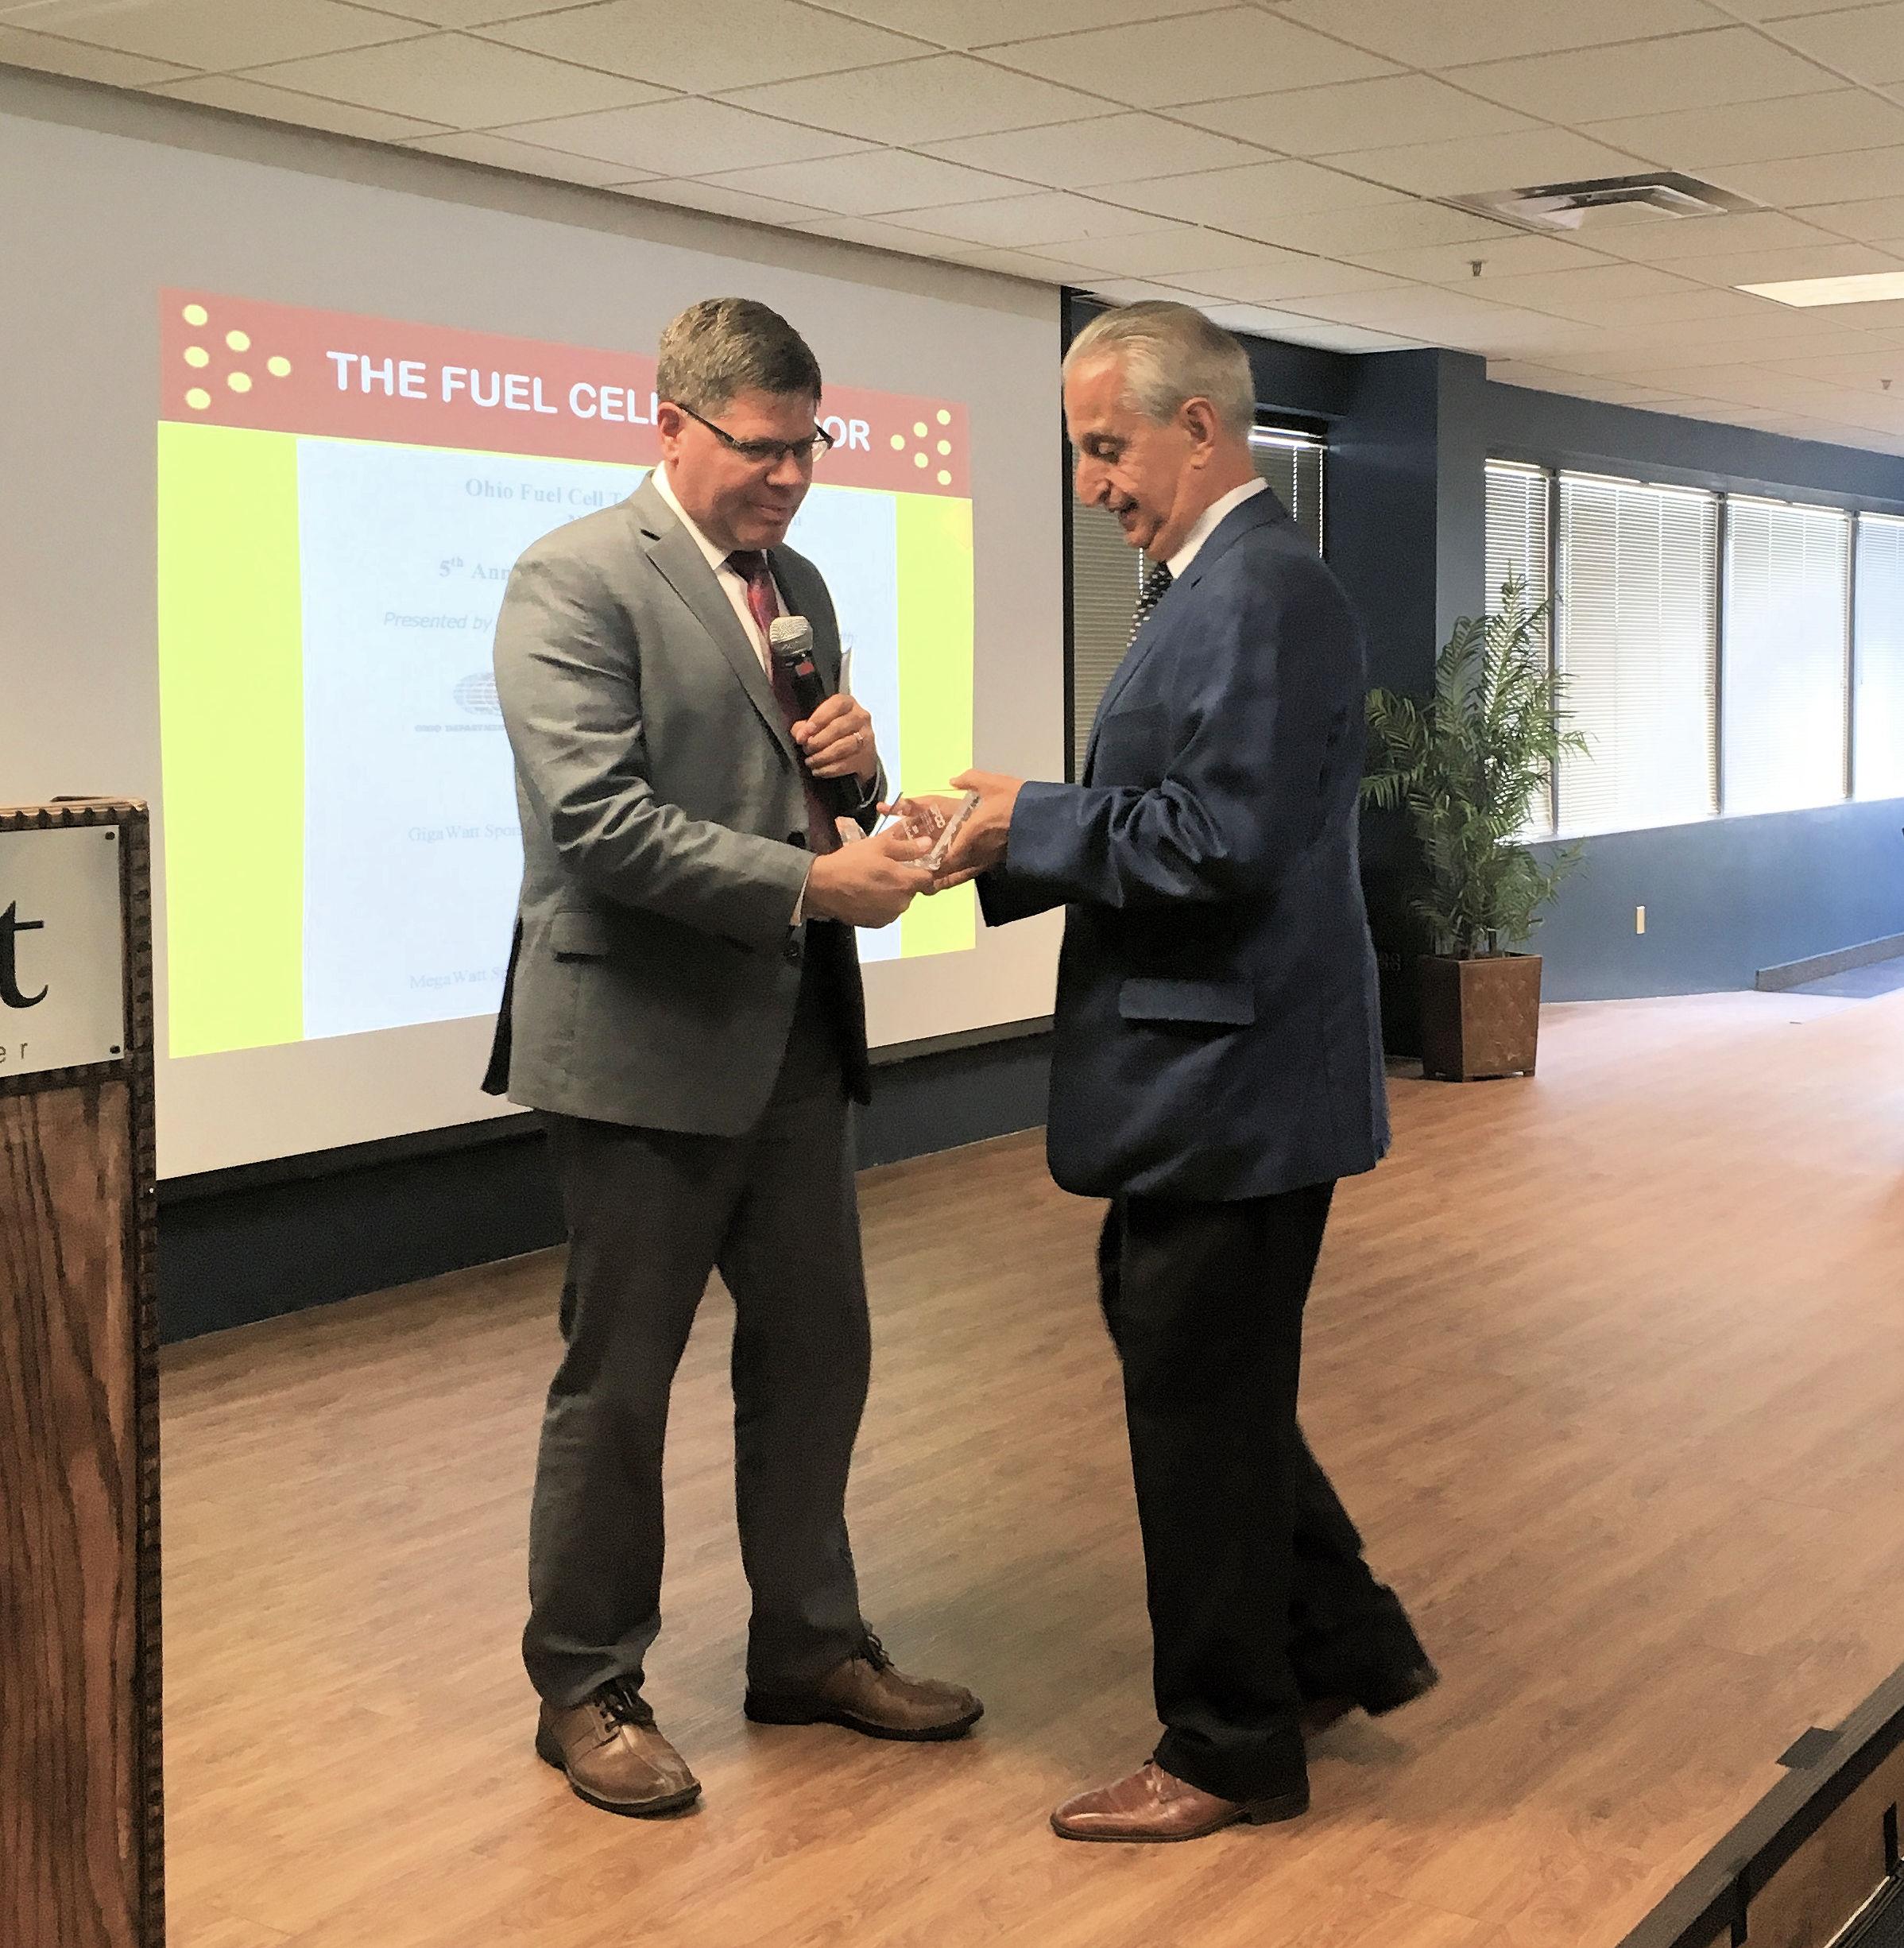 Pat Valente - Dedication & Leadership Award w/K. Conrad